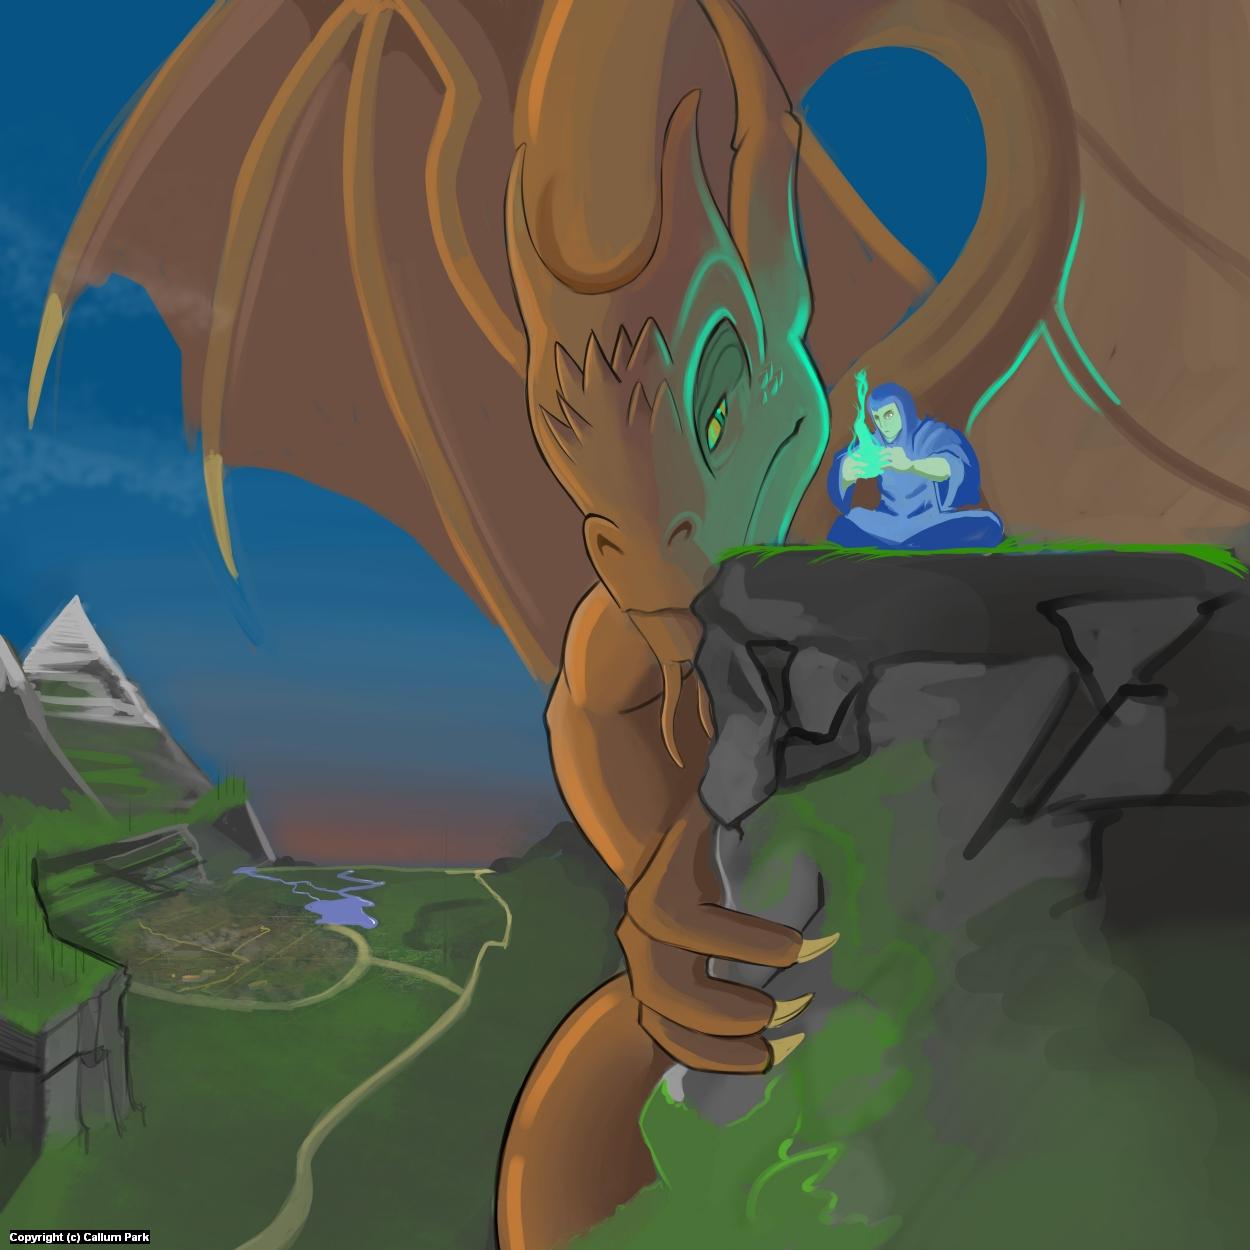 A Dragons Magic Artwork by Callum Park